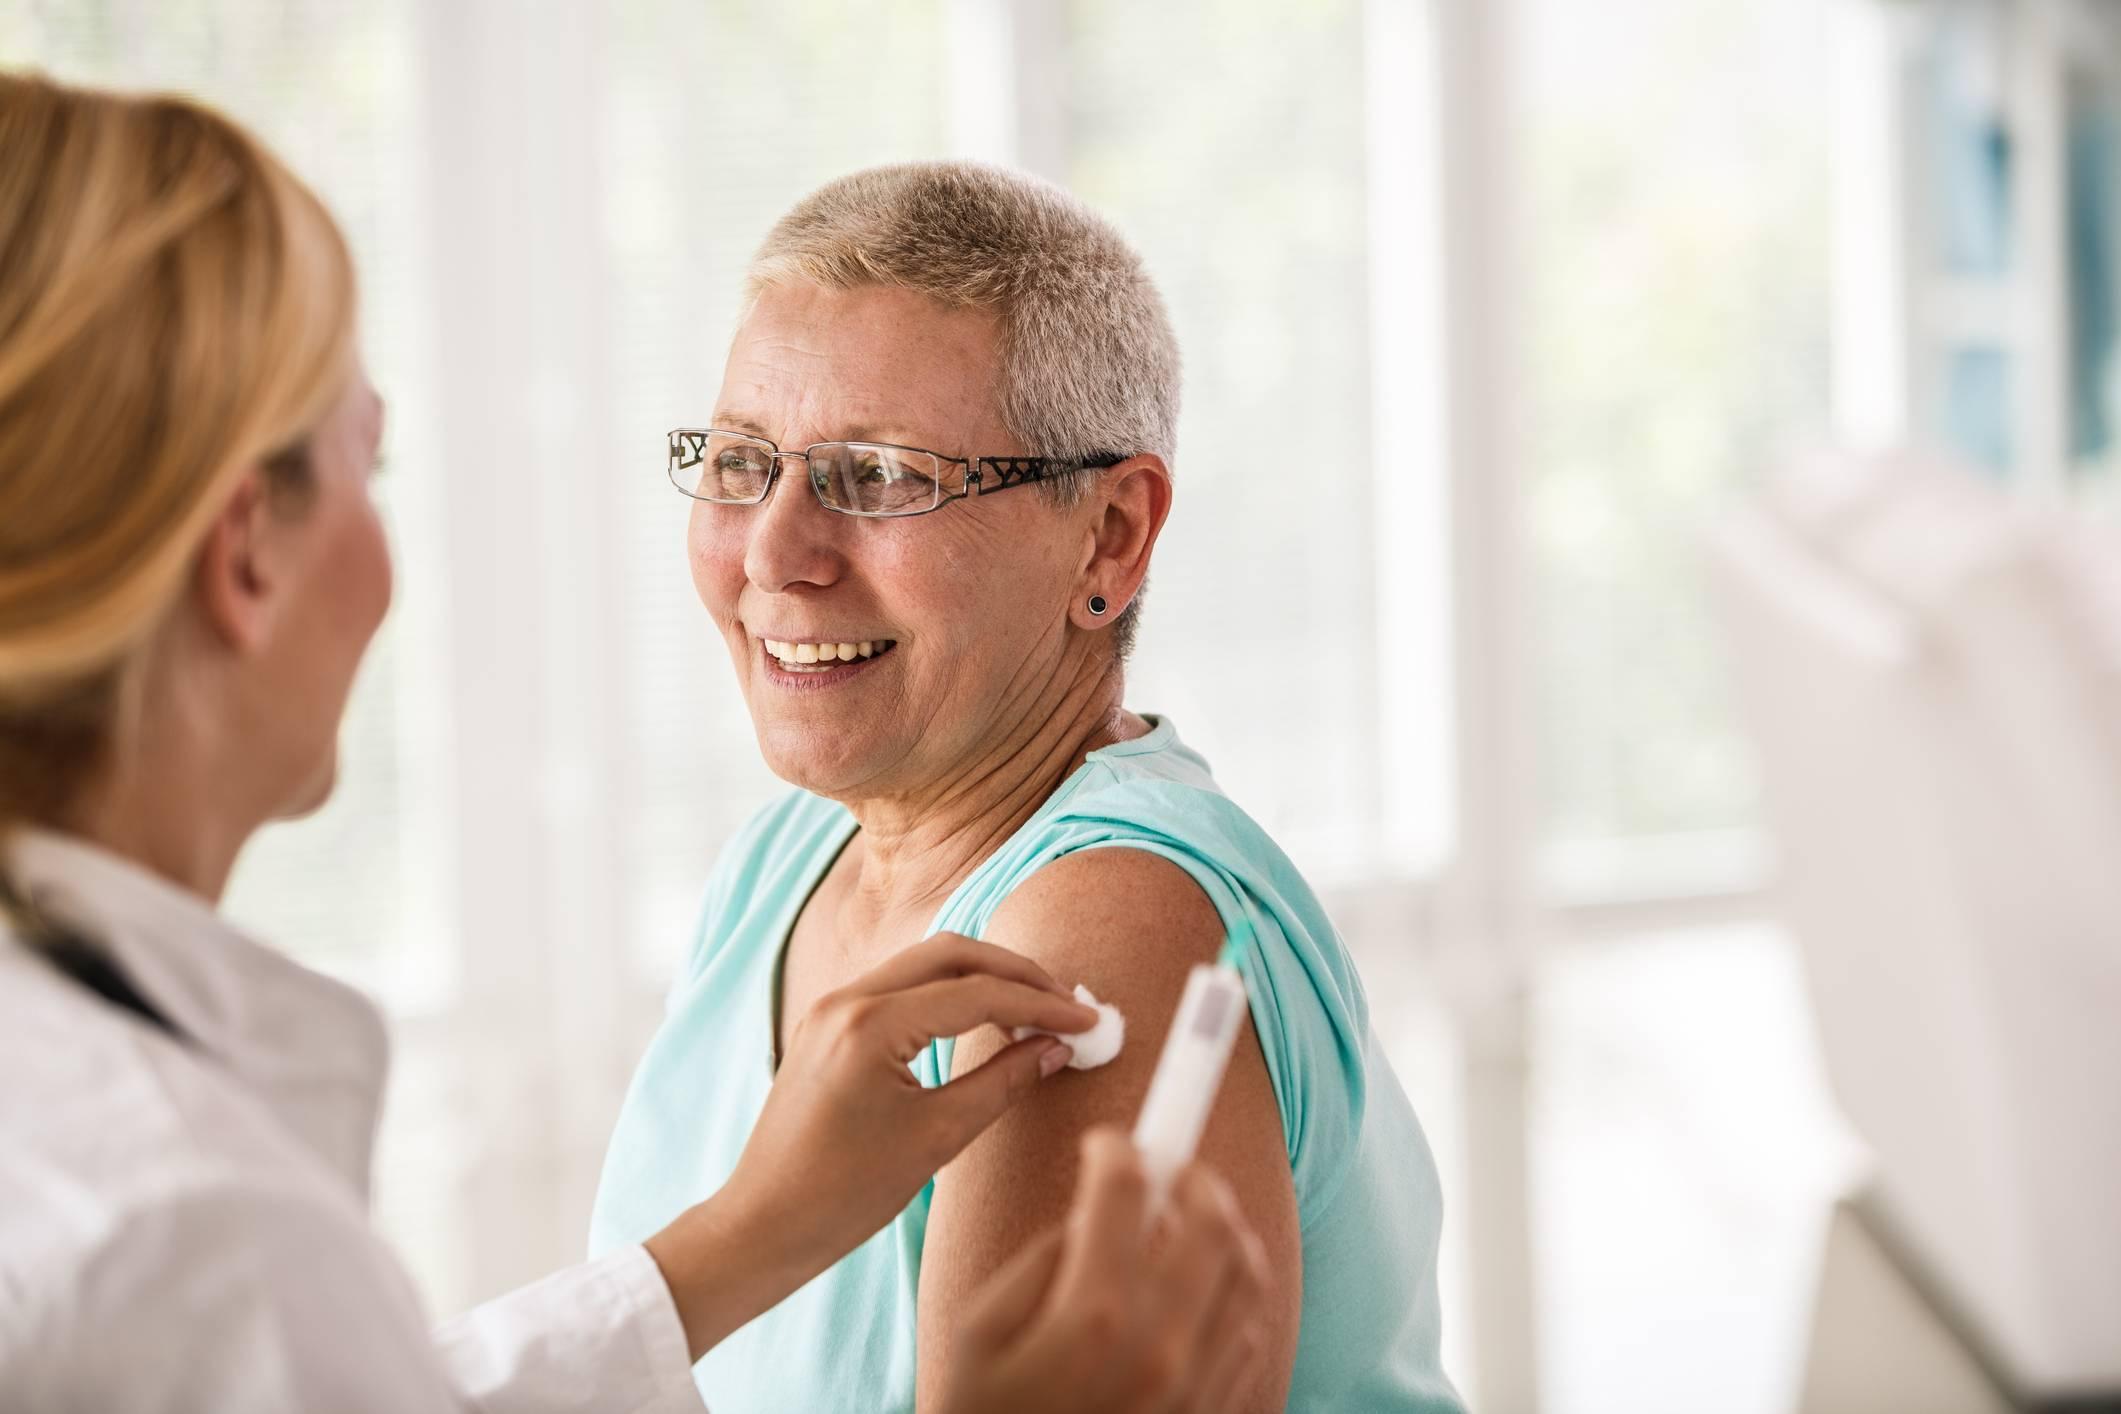 www.juicysantos.com.br - mulher idosa tomando vacina